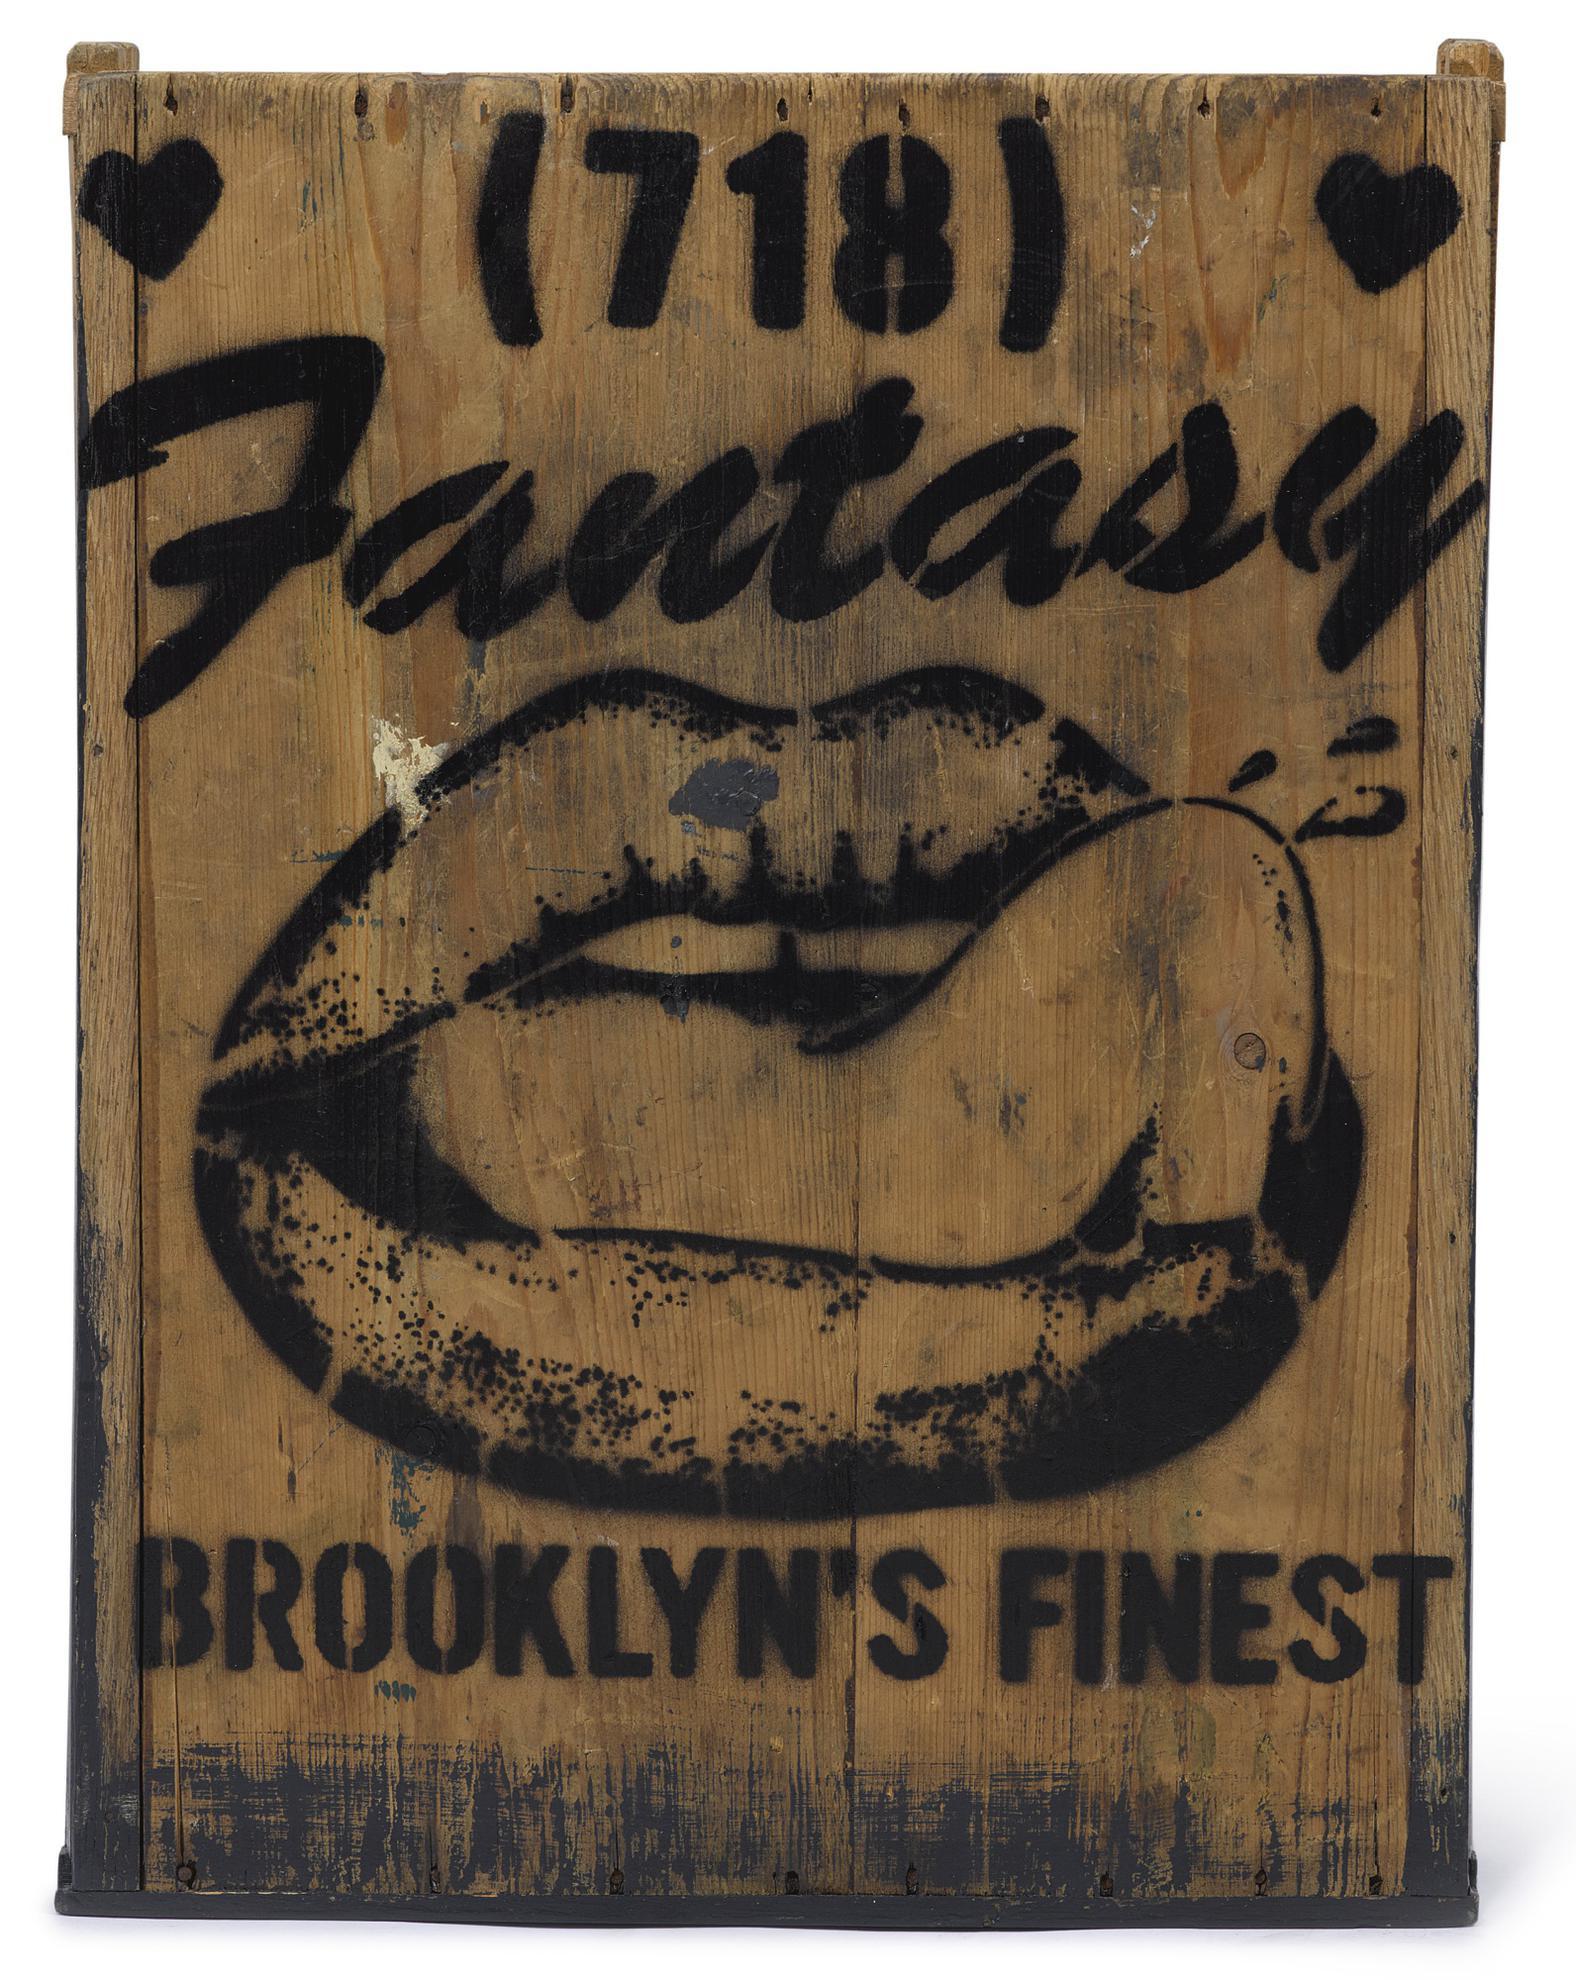 Faile-(718) Fantasy Brooklyns Finest-2011